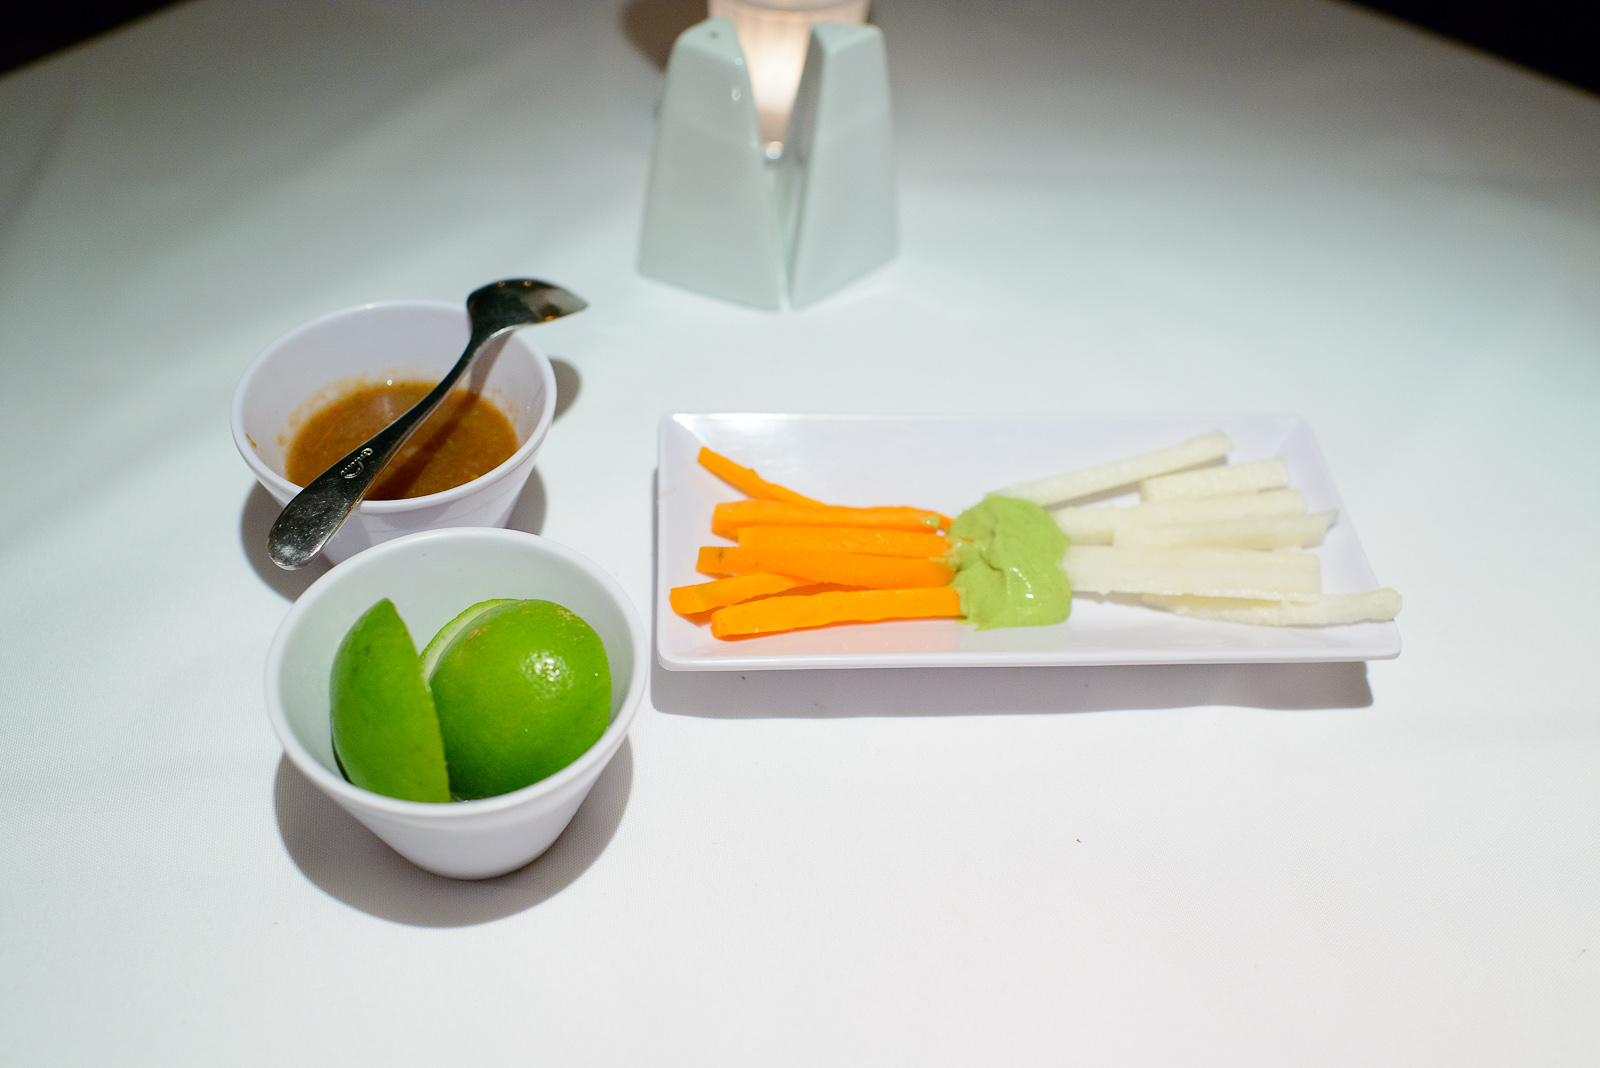 Carrots and Jícama, poblano pepper salsa